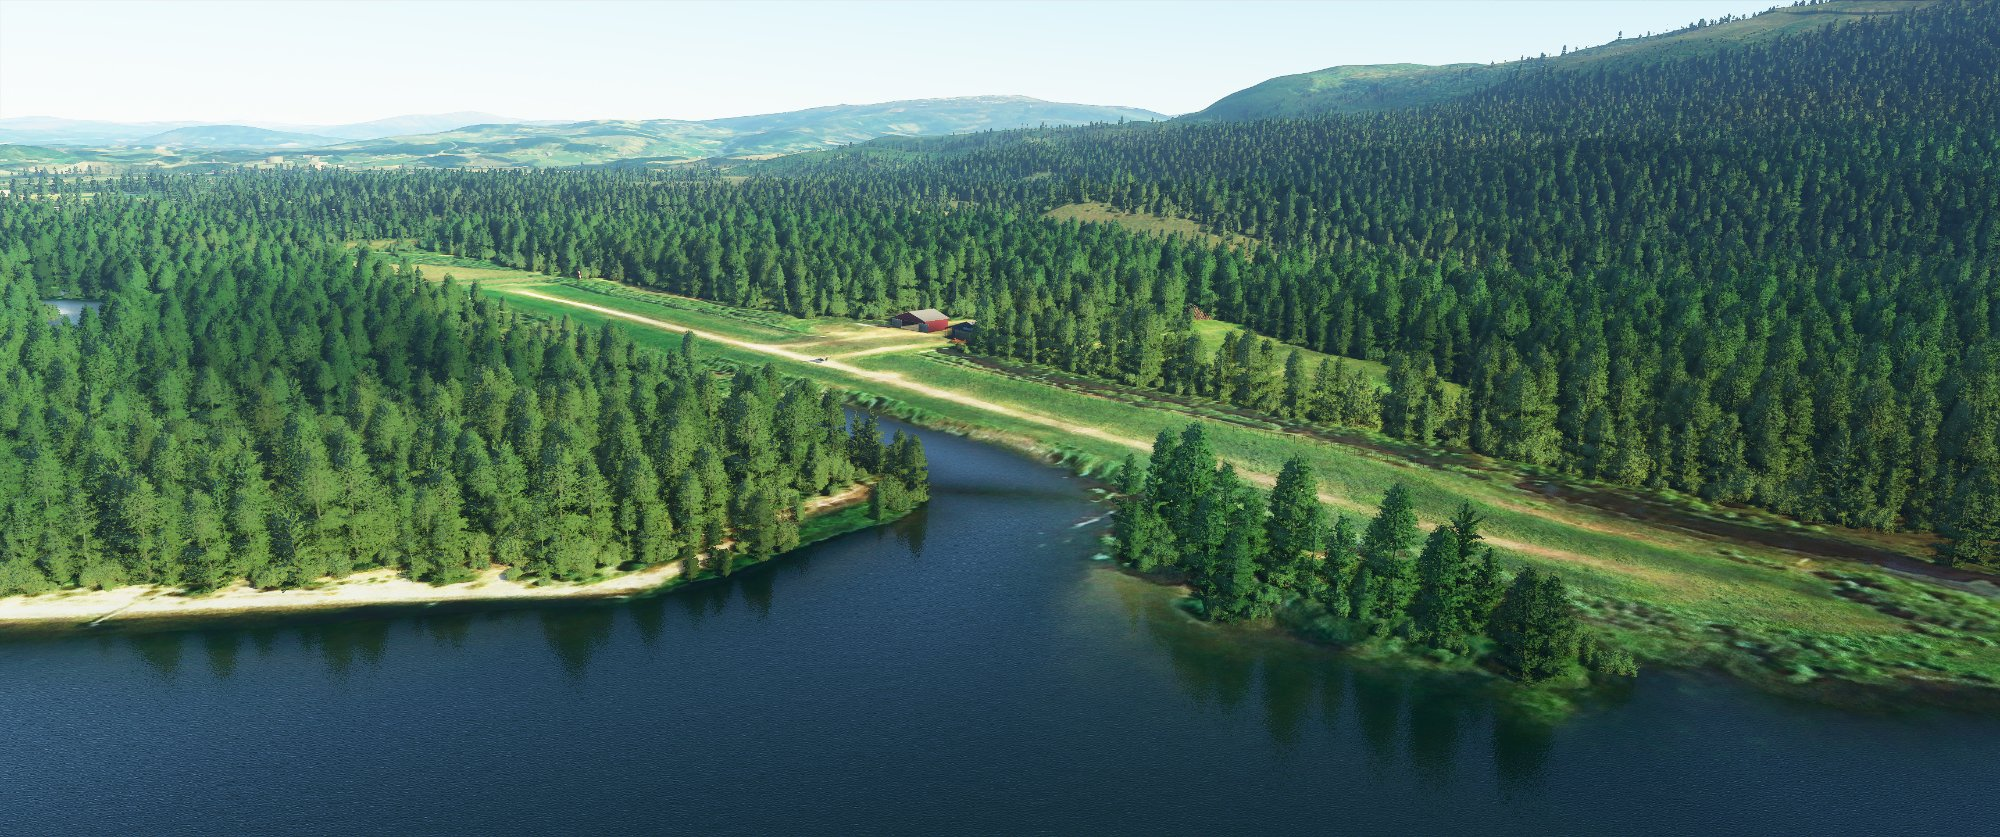 Microsoft Flight Simulator Screenshot 2020.10.07 - 15.58.00.100.jpg